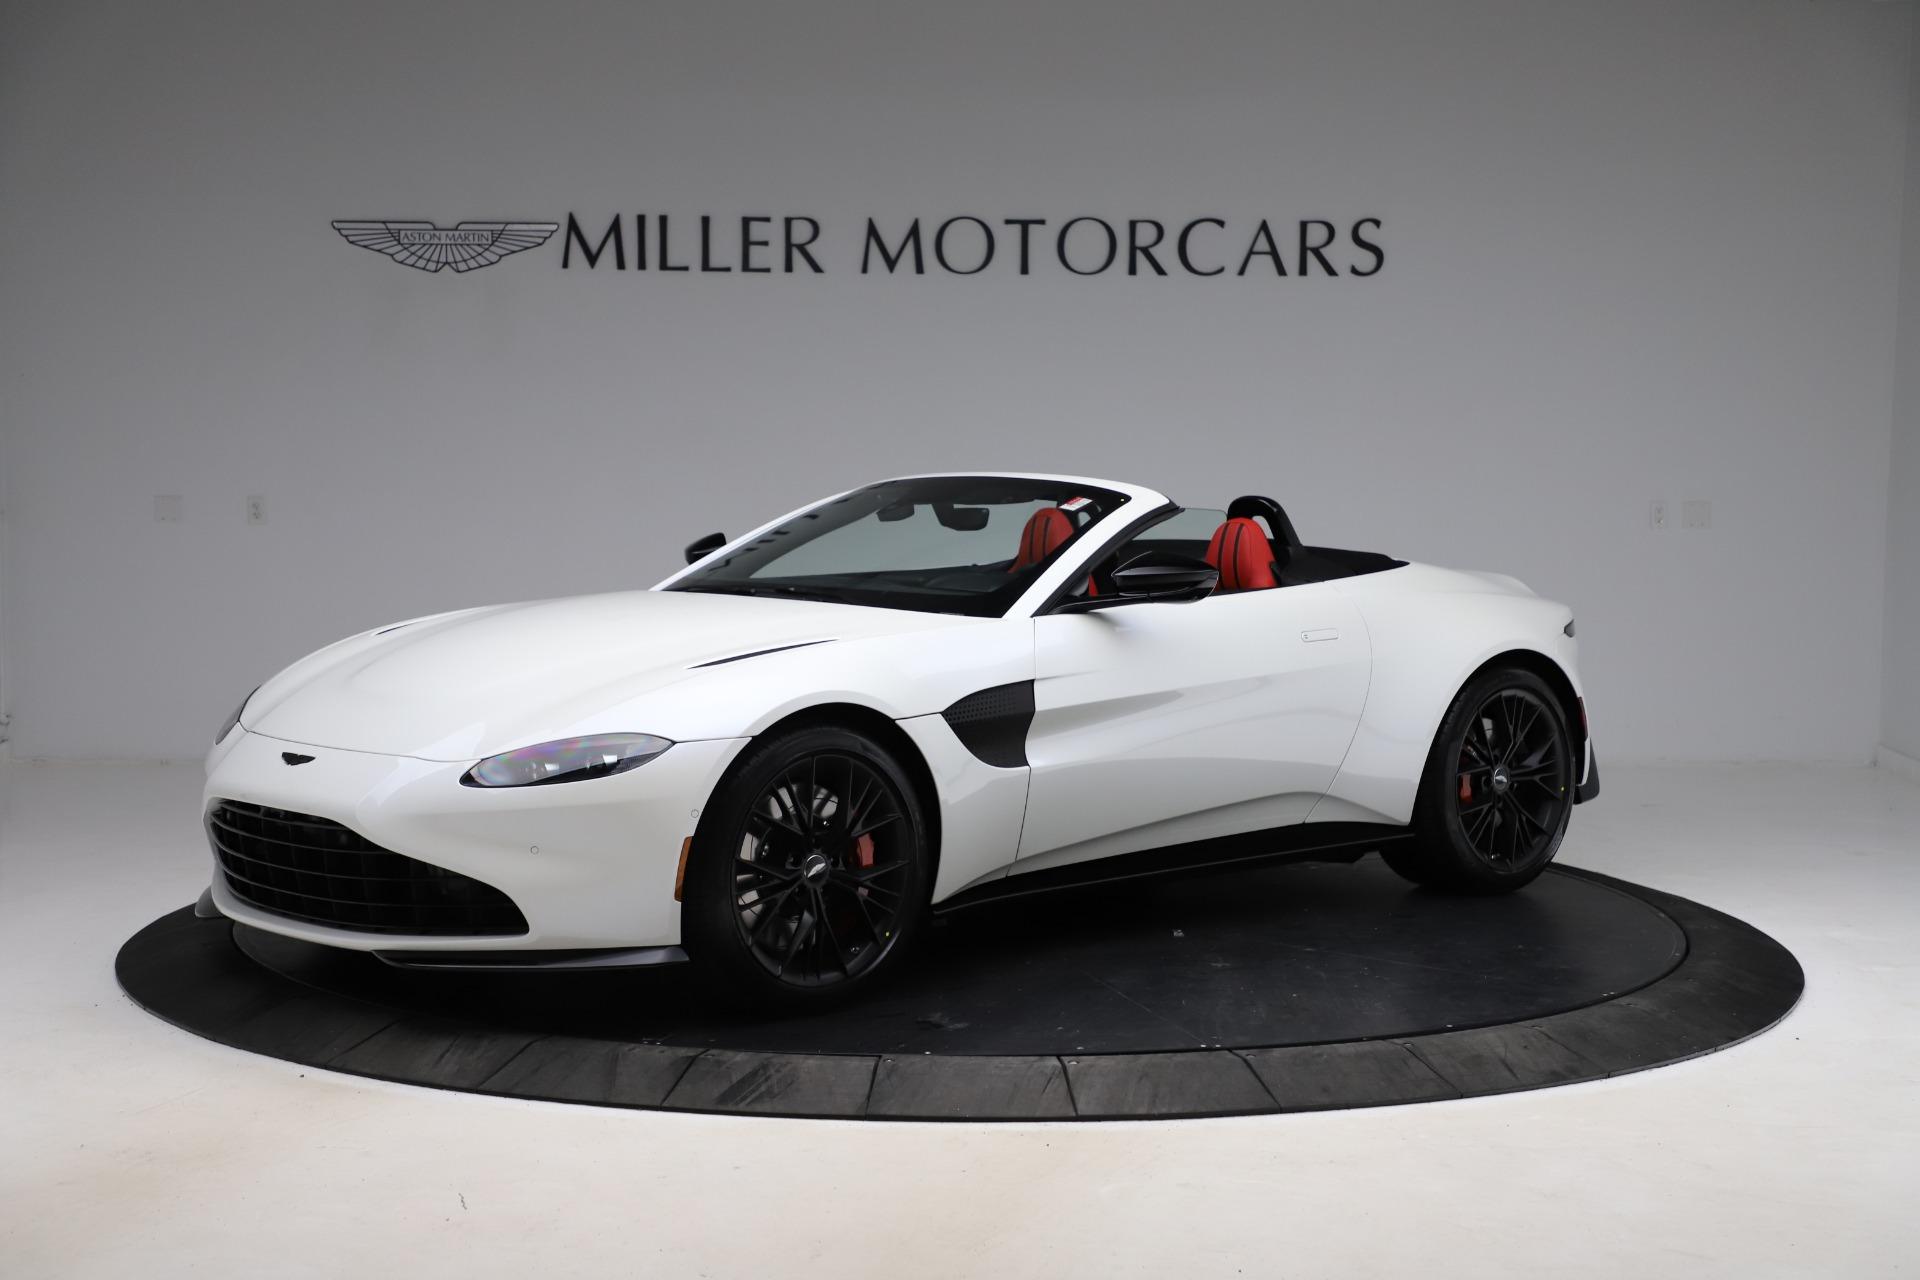 New 2021 Aston Martin Vantage Roadster Convertible for sale $189,186 at Alfa Romeo of Westport in Westport CT 06880 1